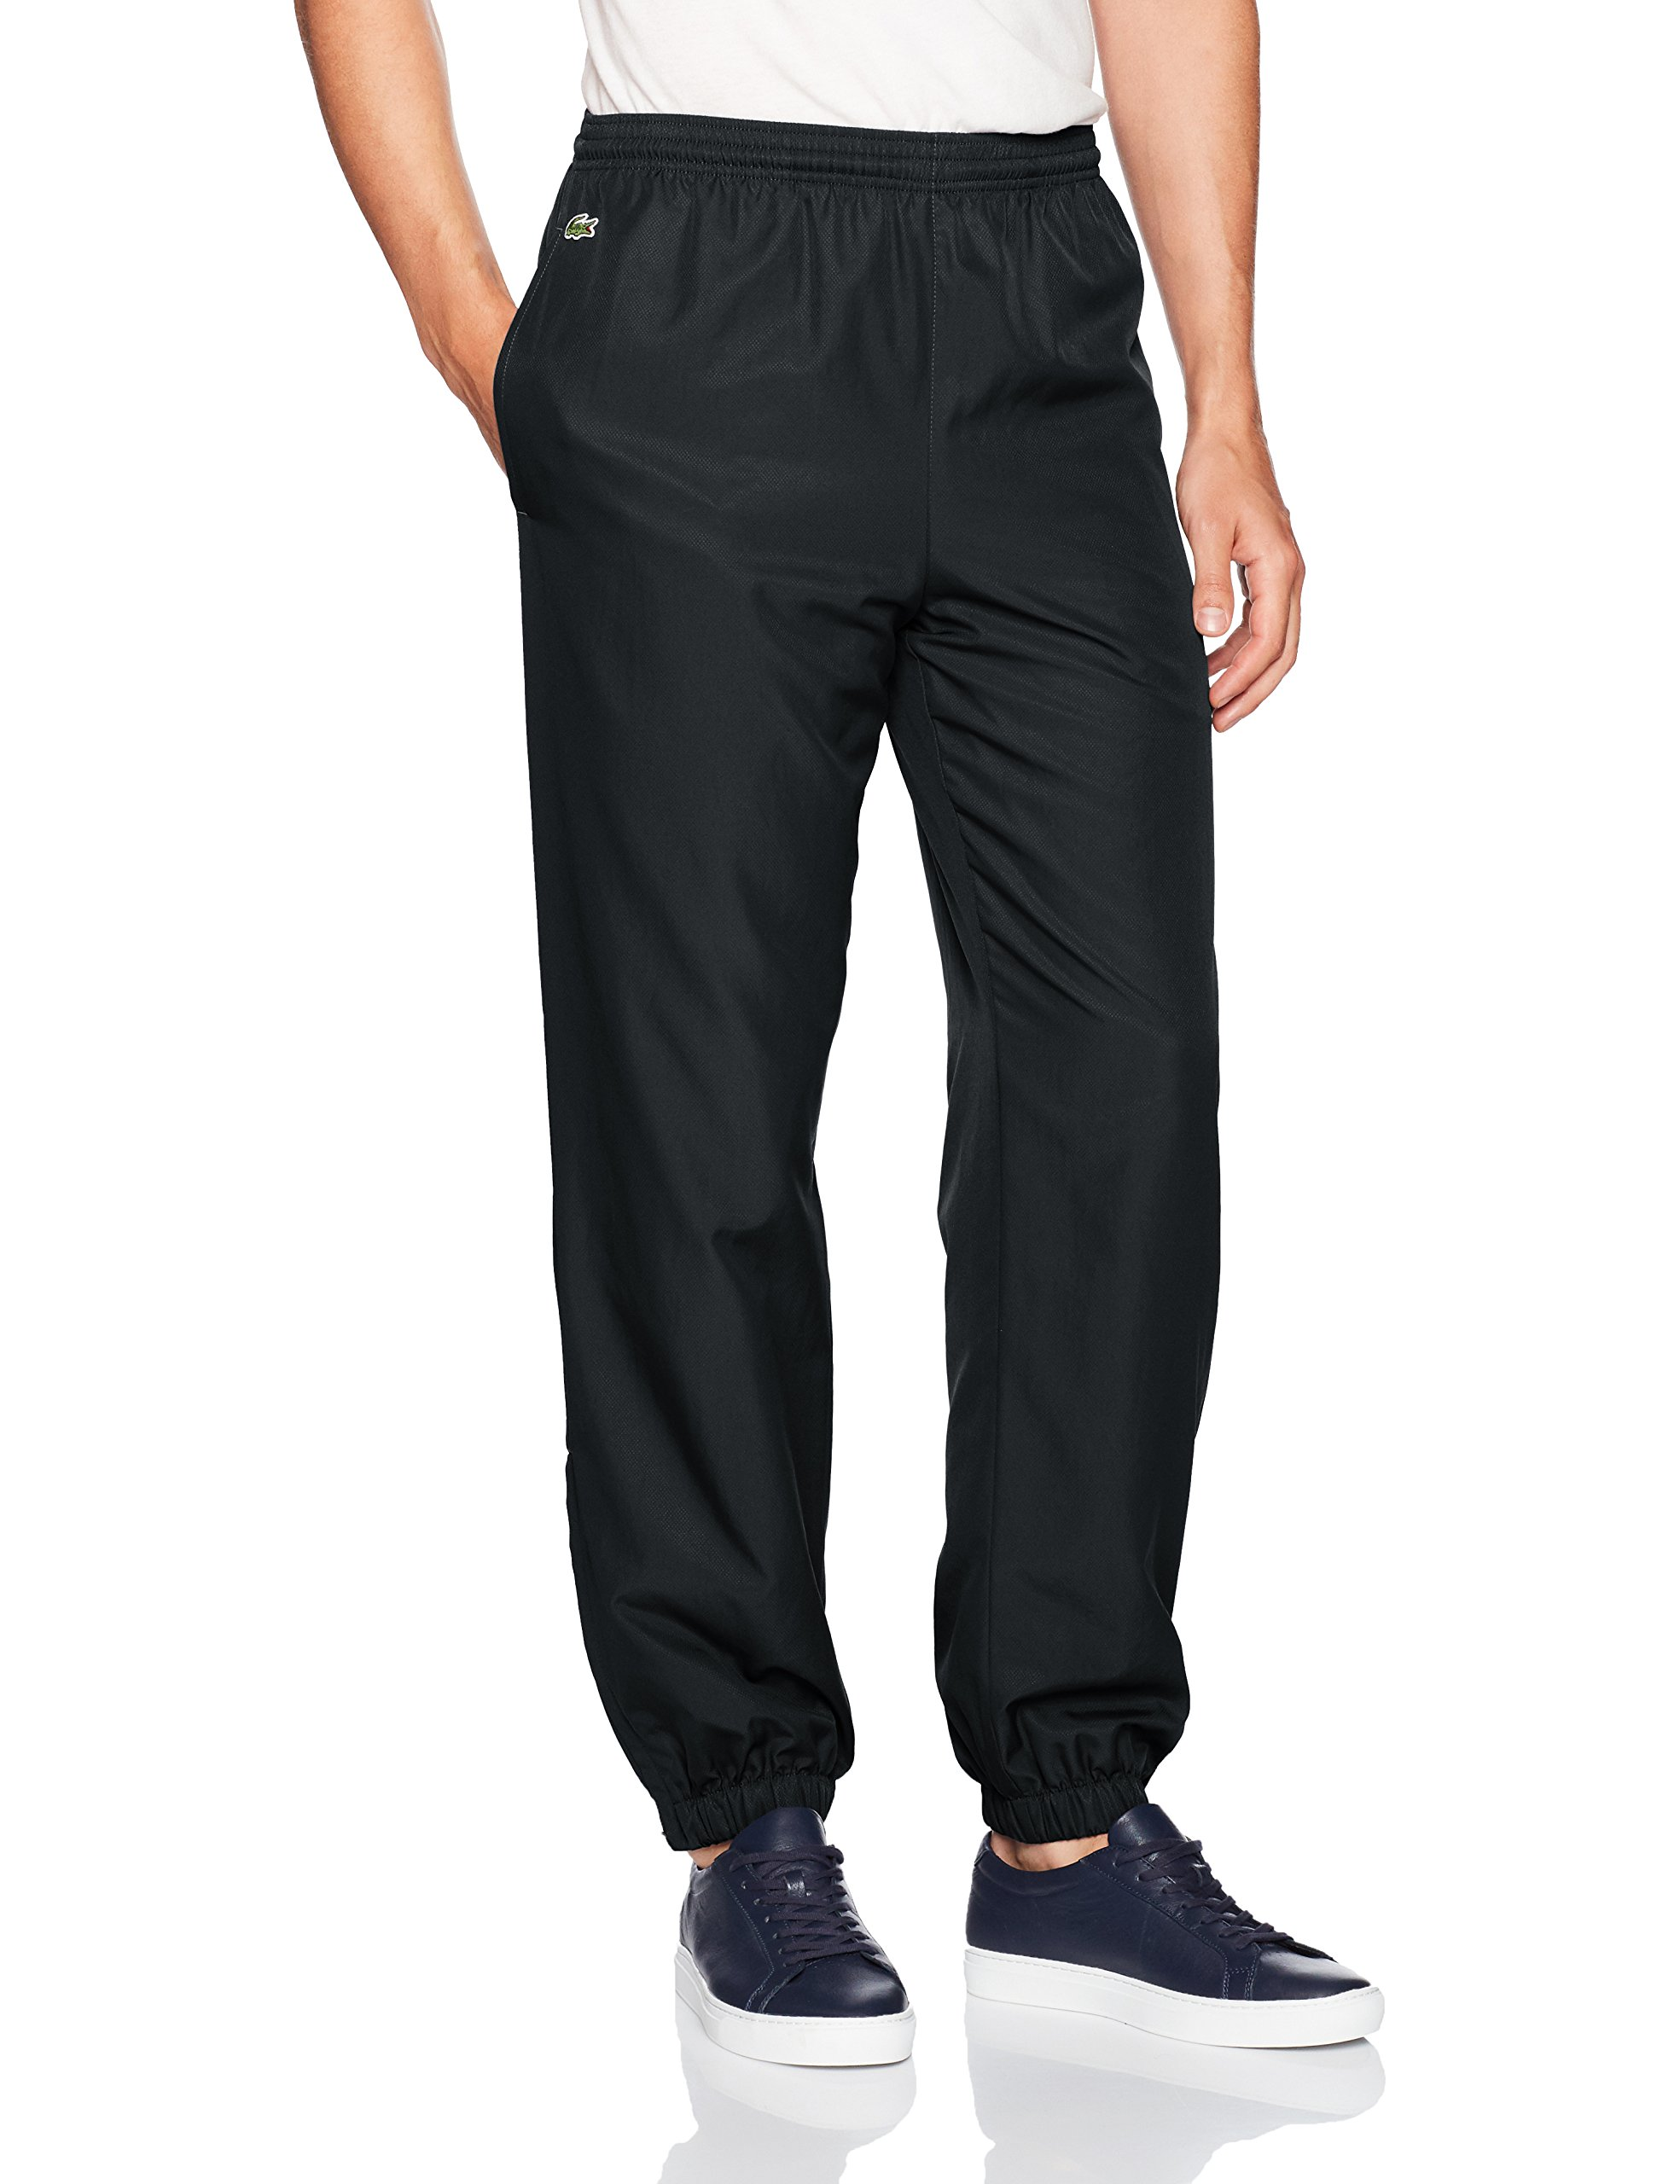 Lacoste Men's Sport Taffetta Pant with Side Zip Detail, XH120T, Black, 4X-Large